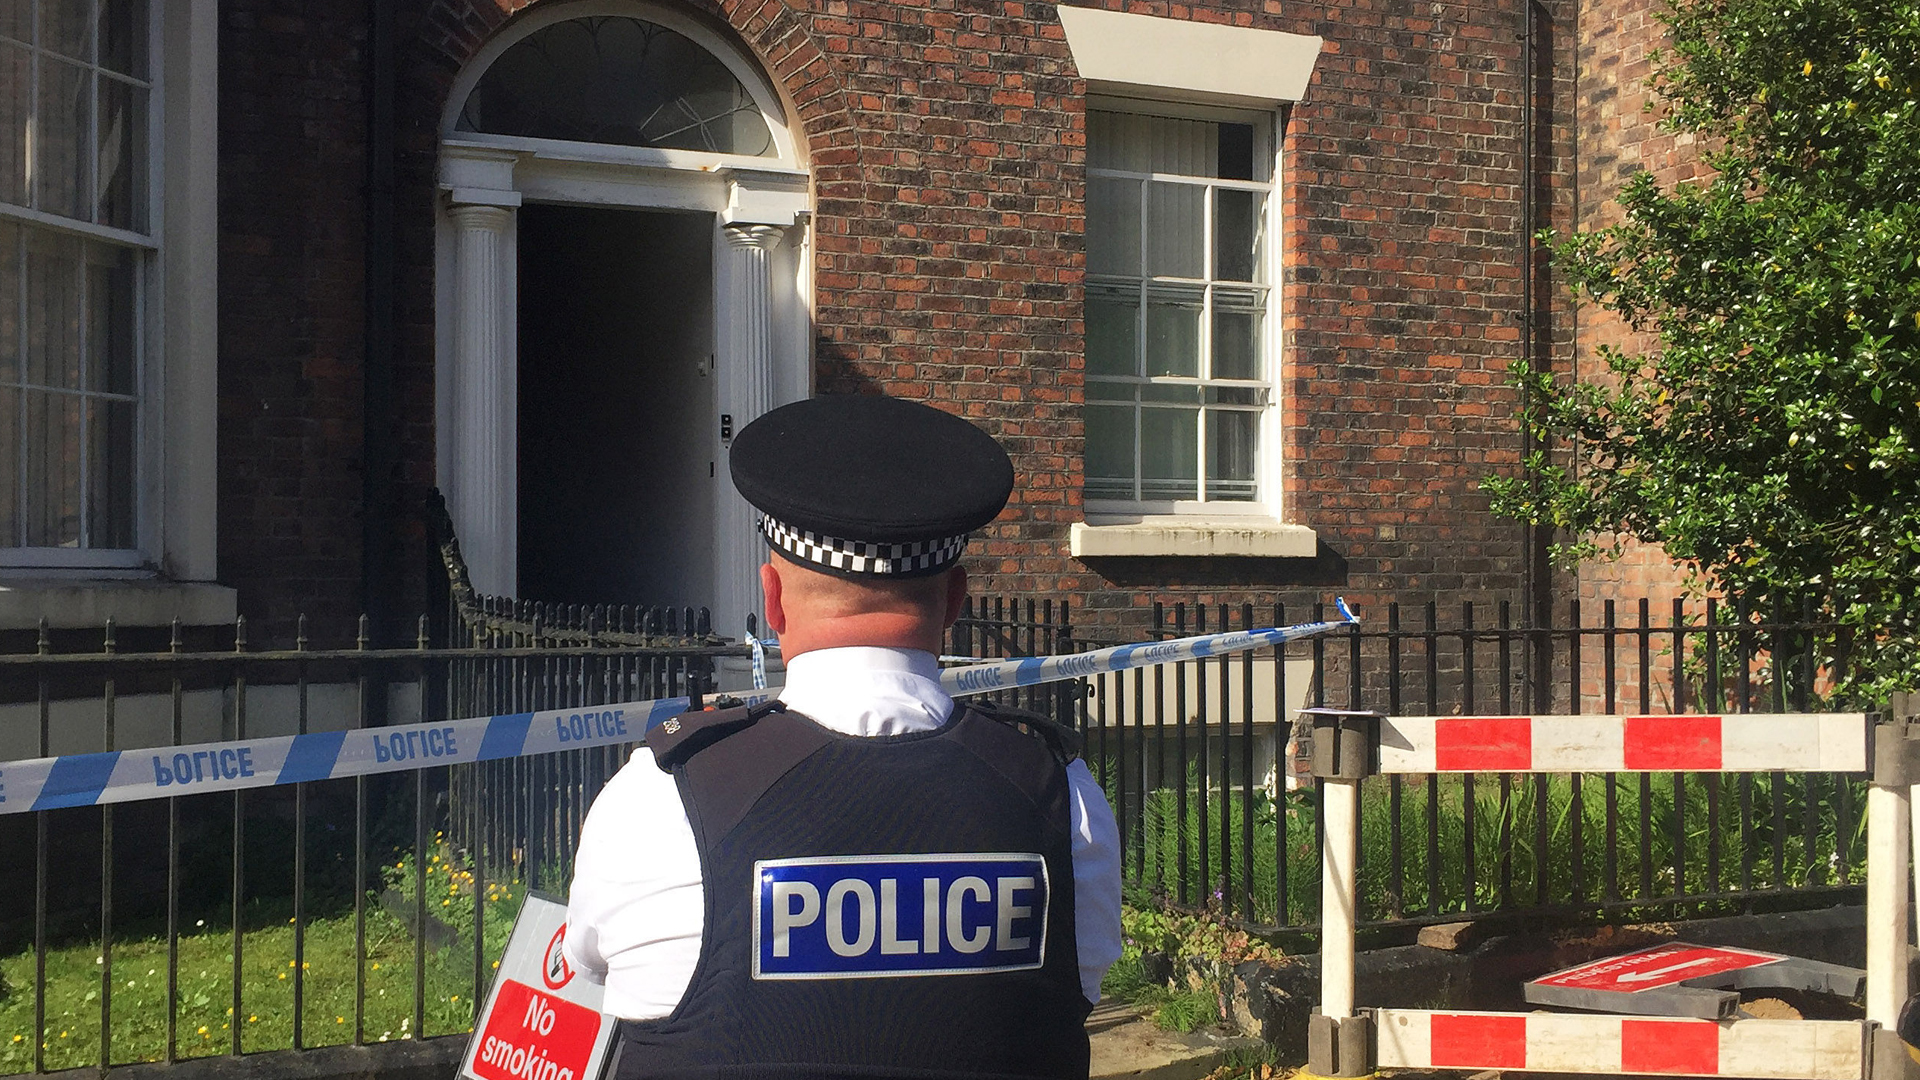 BBC News - Liverpool deaths: Three bodies found in John Lennon's former flat